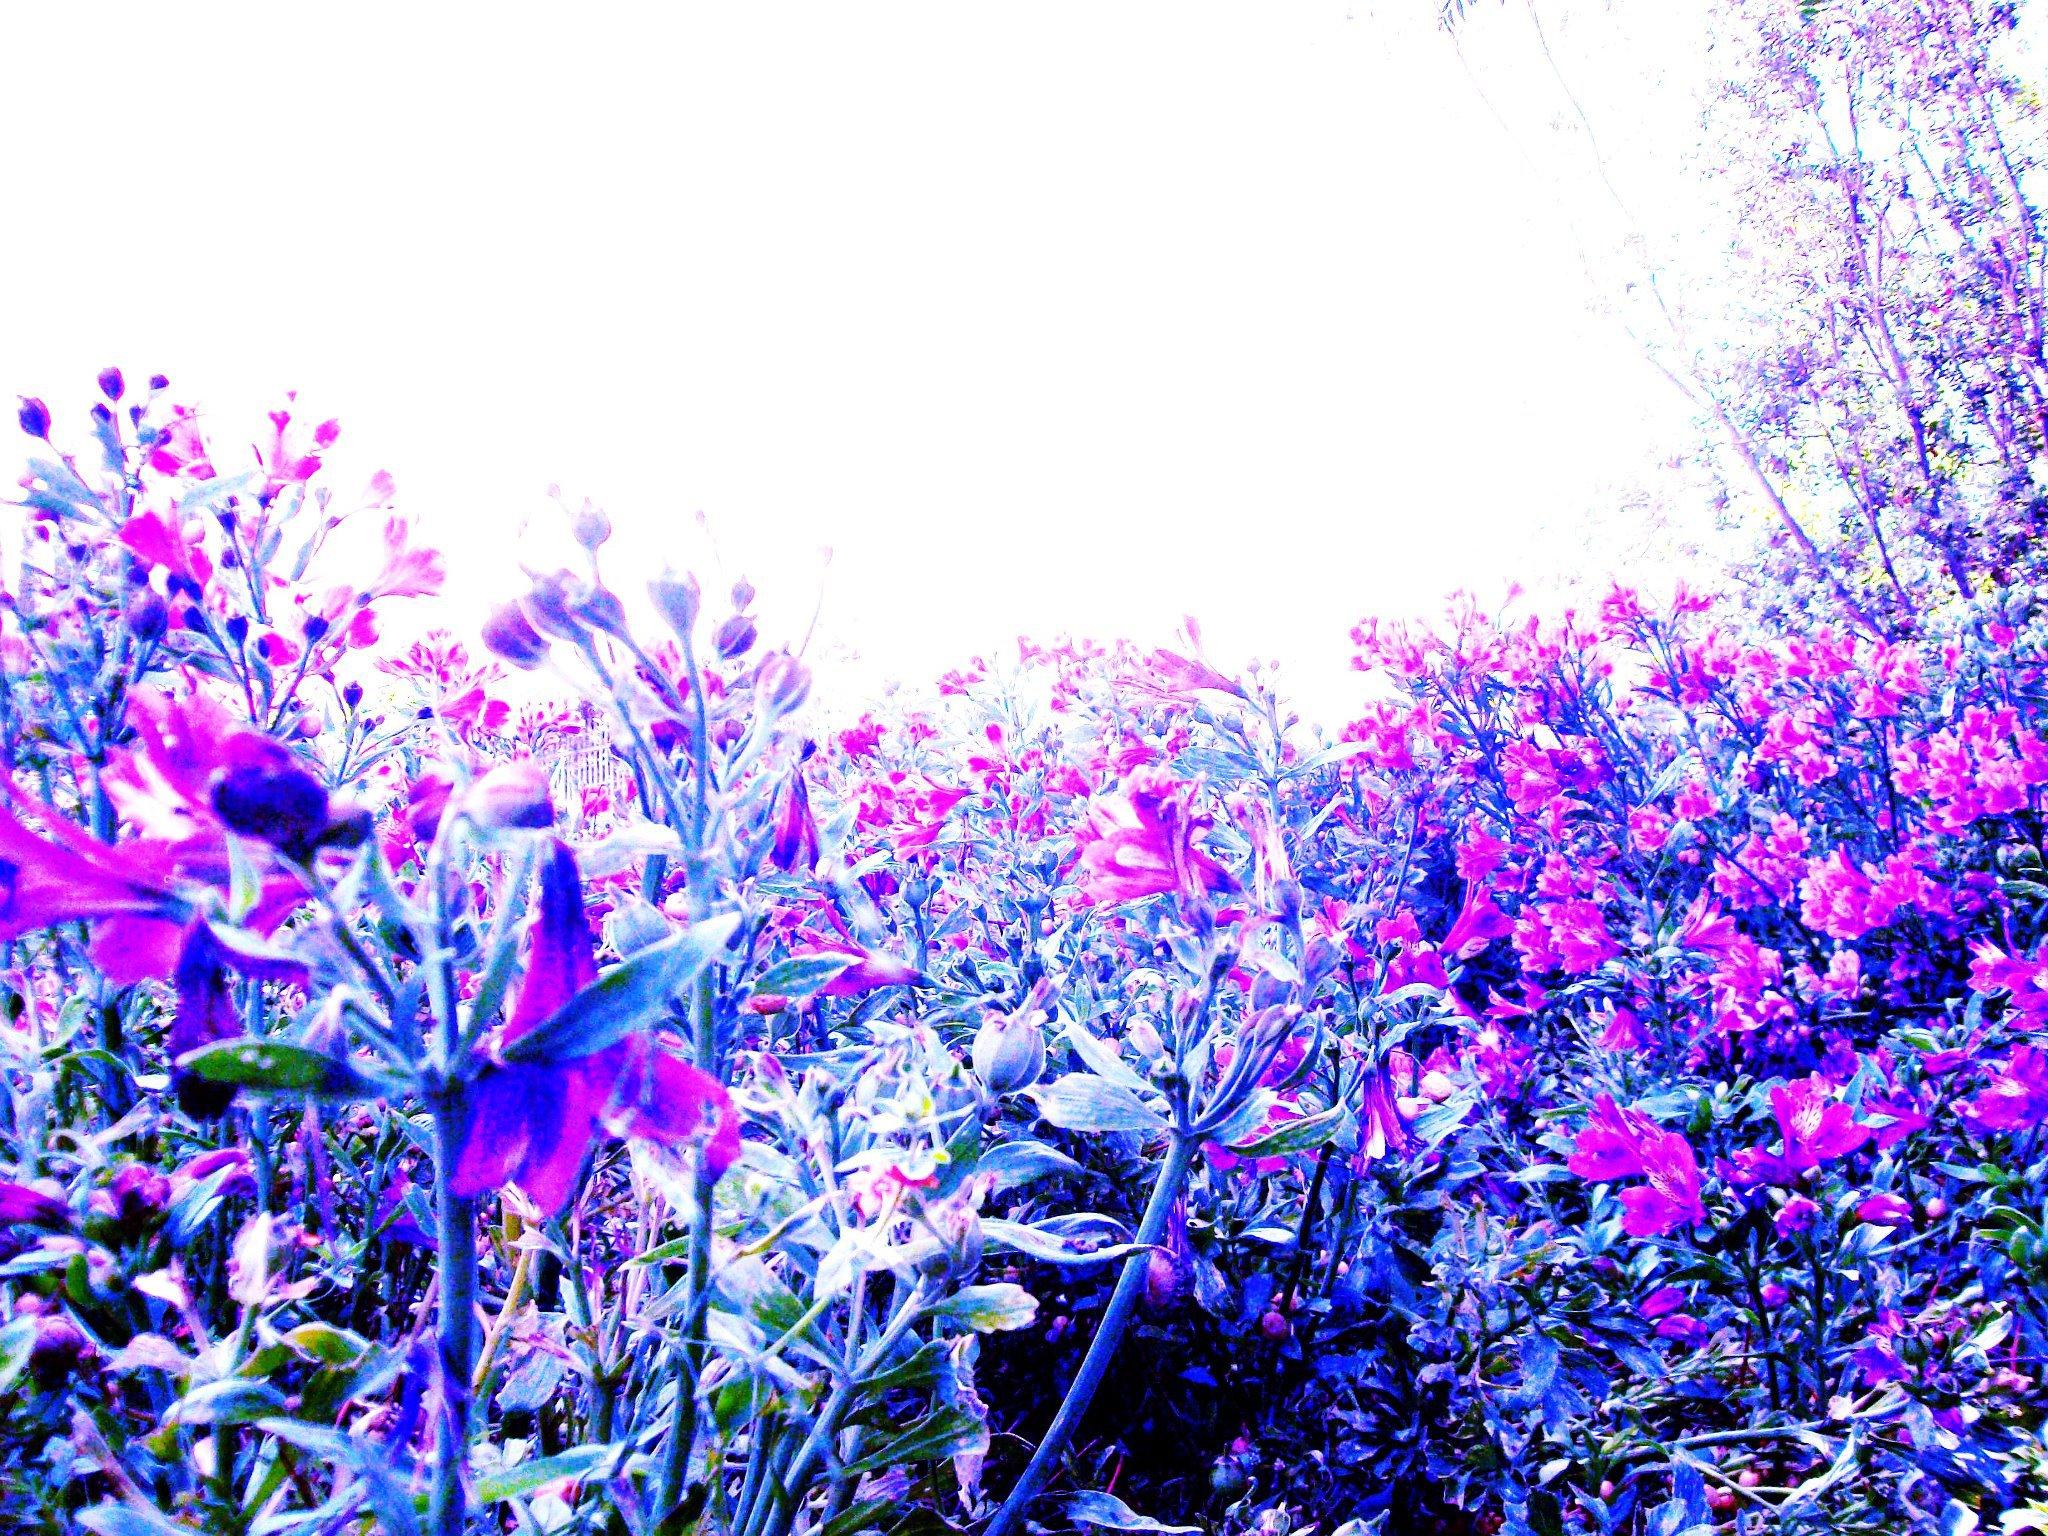 intheflowers.jpg